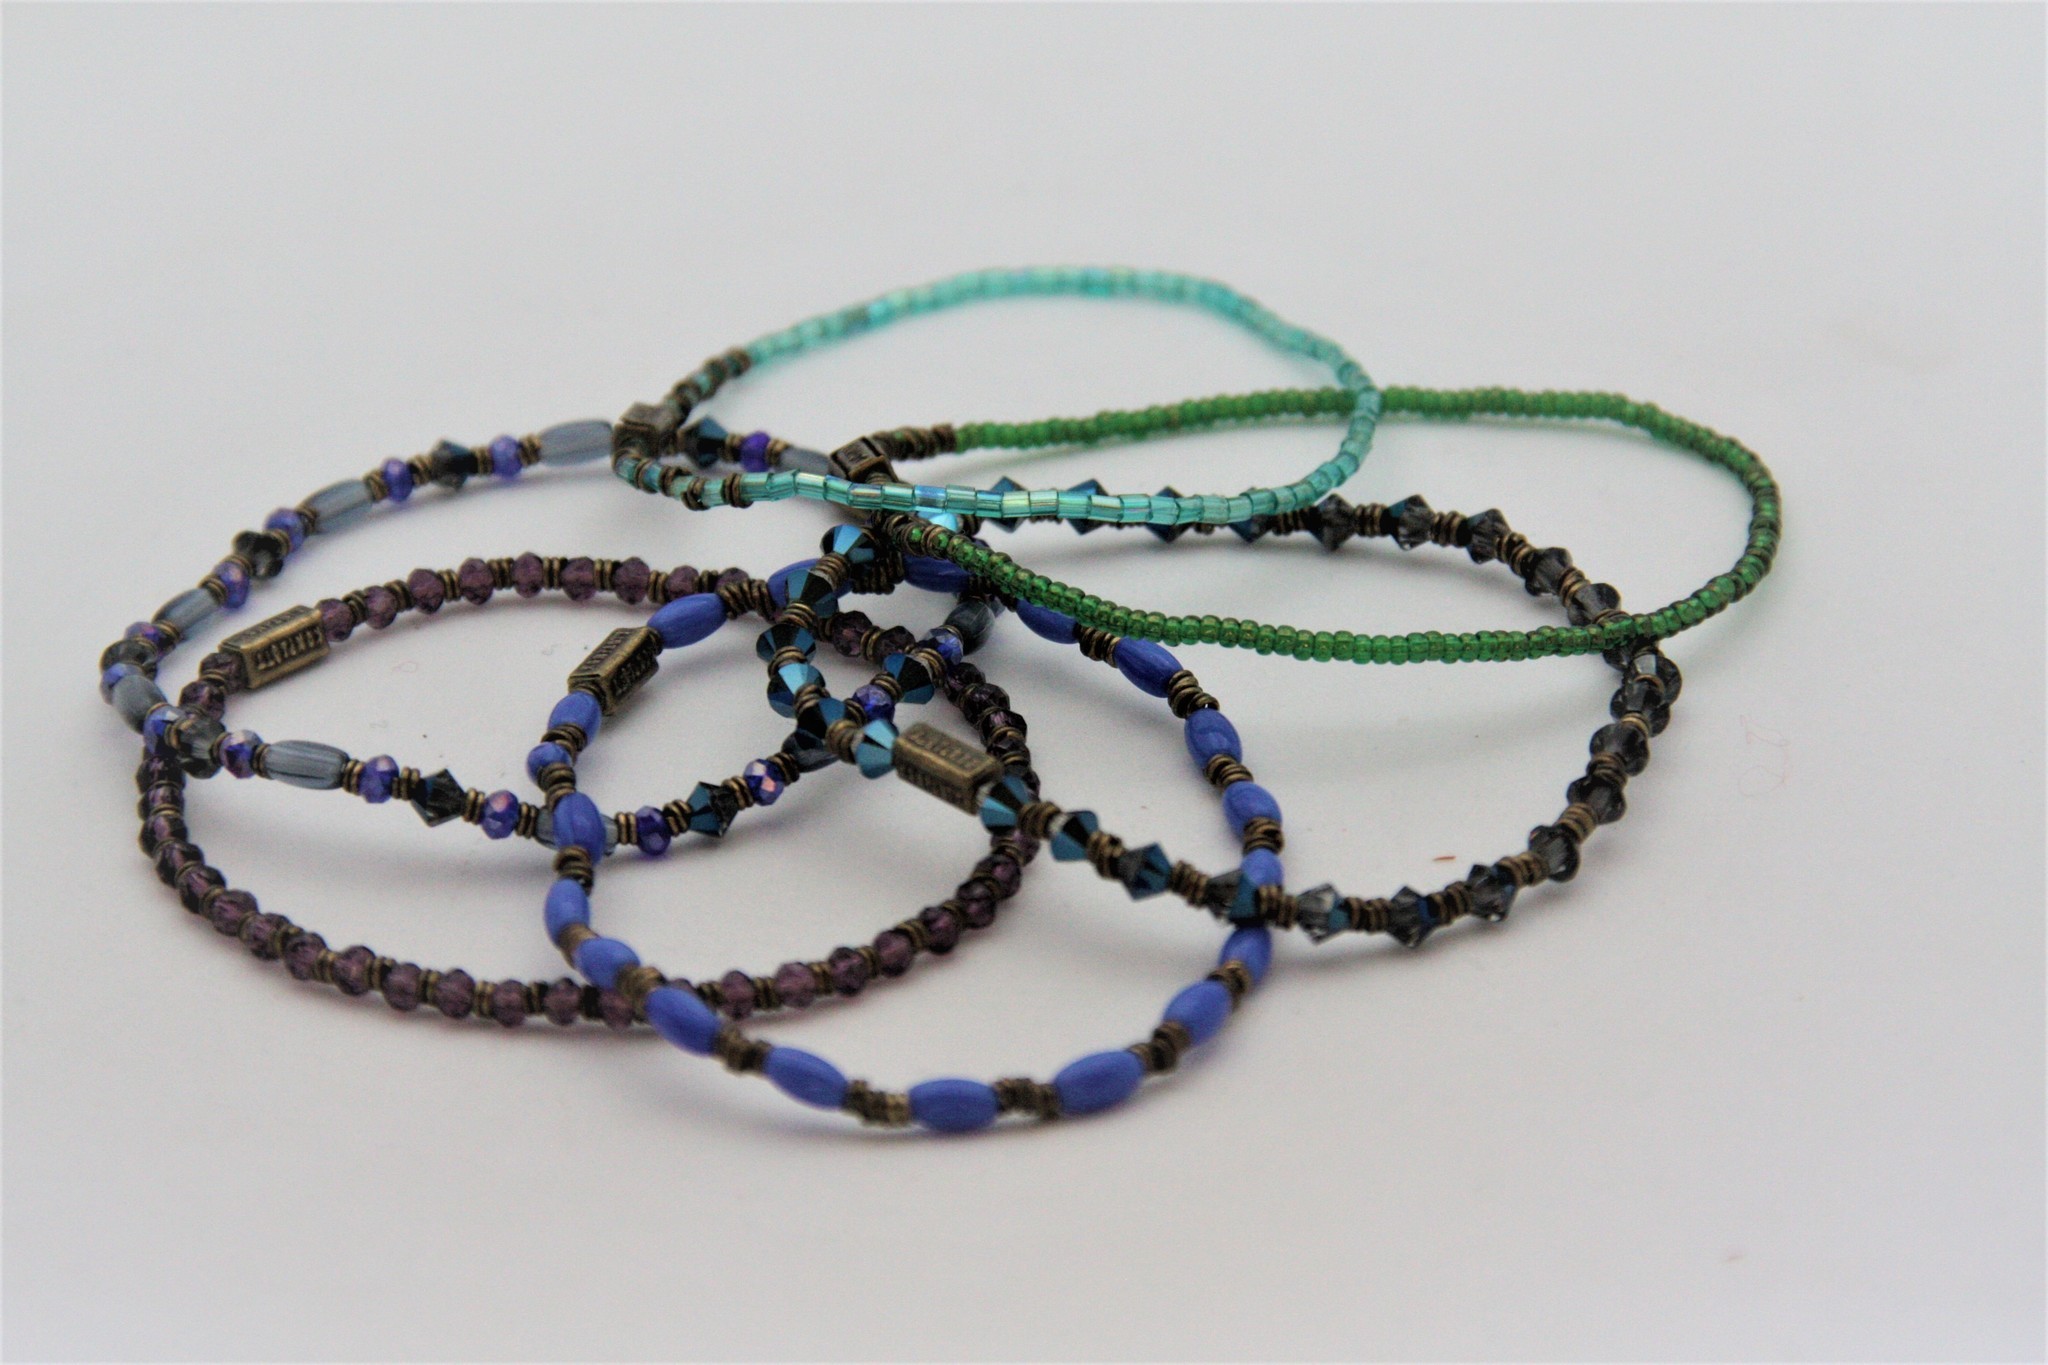 Konplott Blue Konplott bracelets